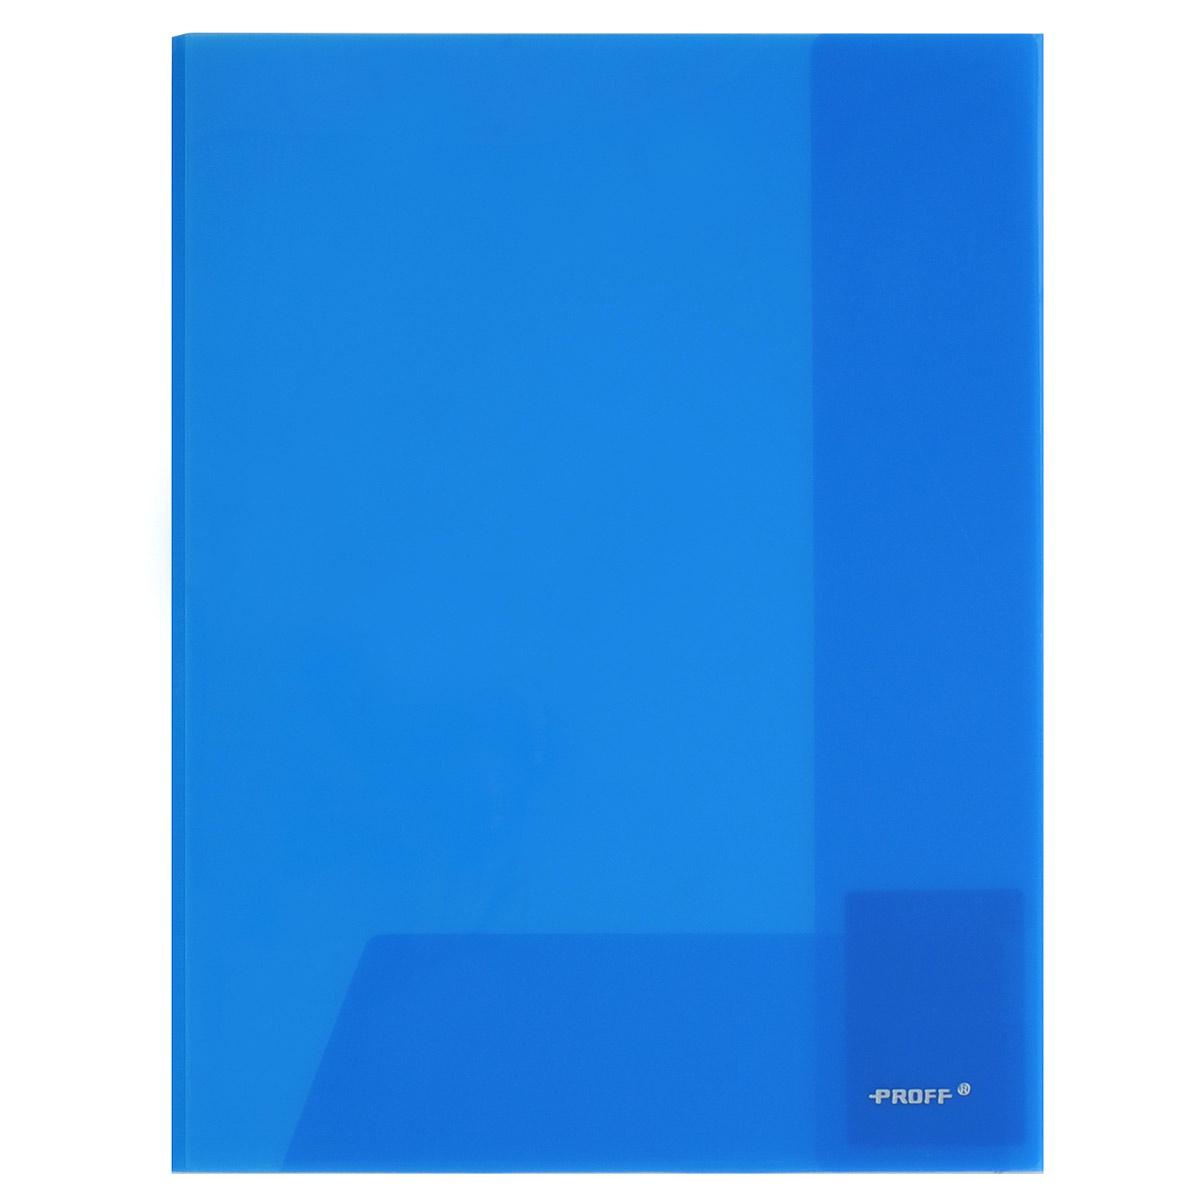 Папка-уголок Proff, цвет: синий, 2 клапана. Формат А4 20 pcs ry series metal 192 celsius 250v 10a cutoffs thermal fuse